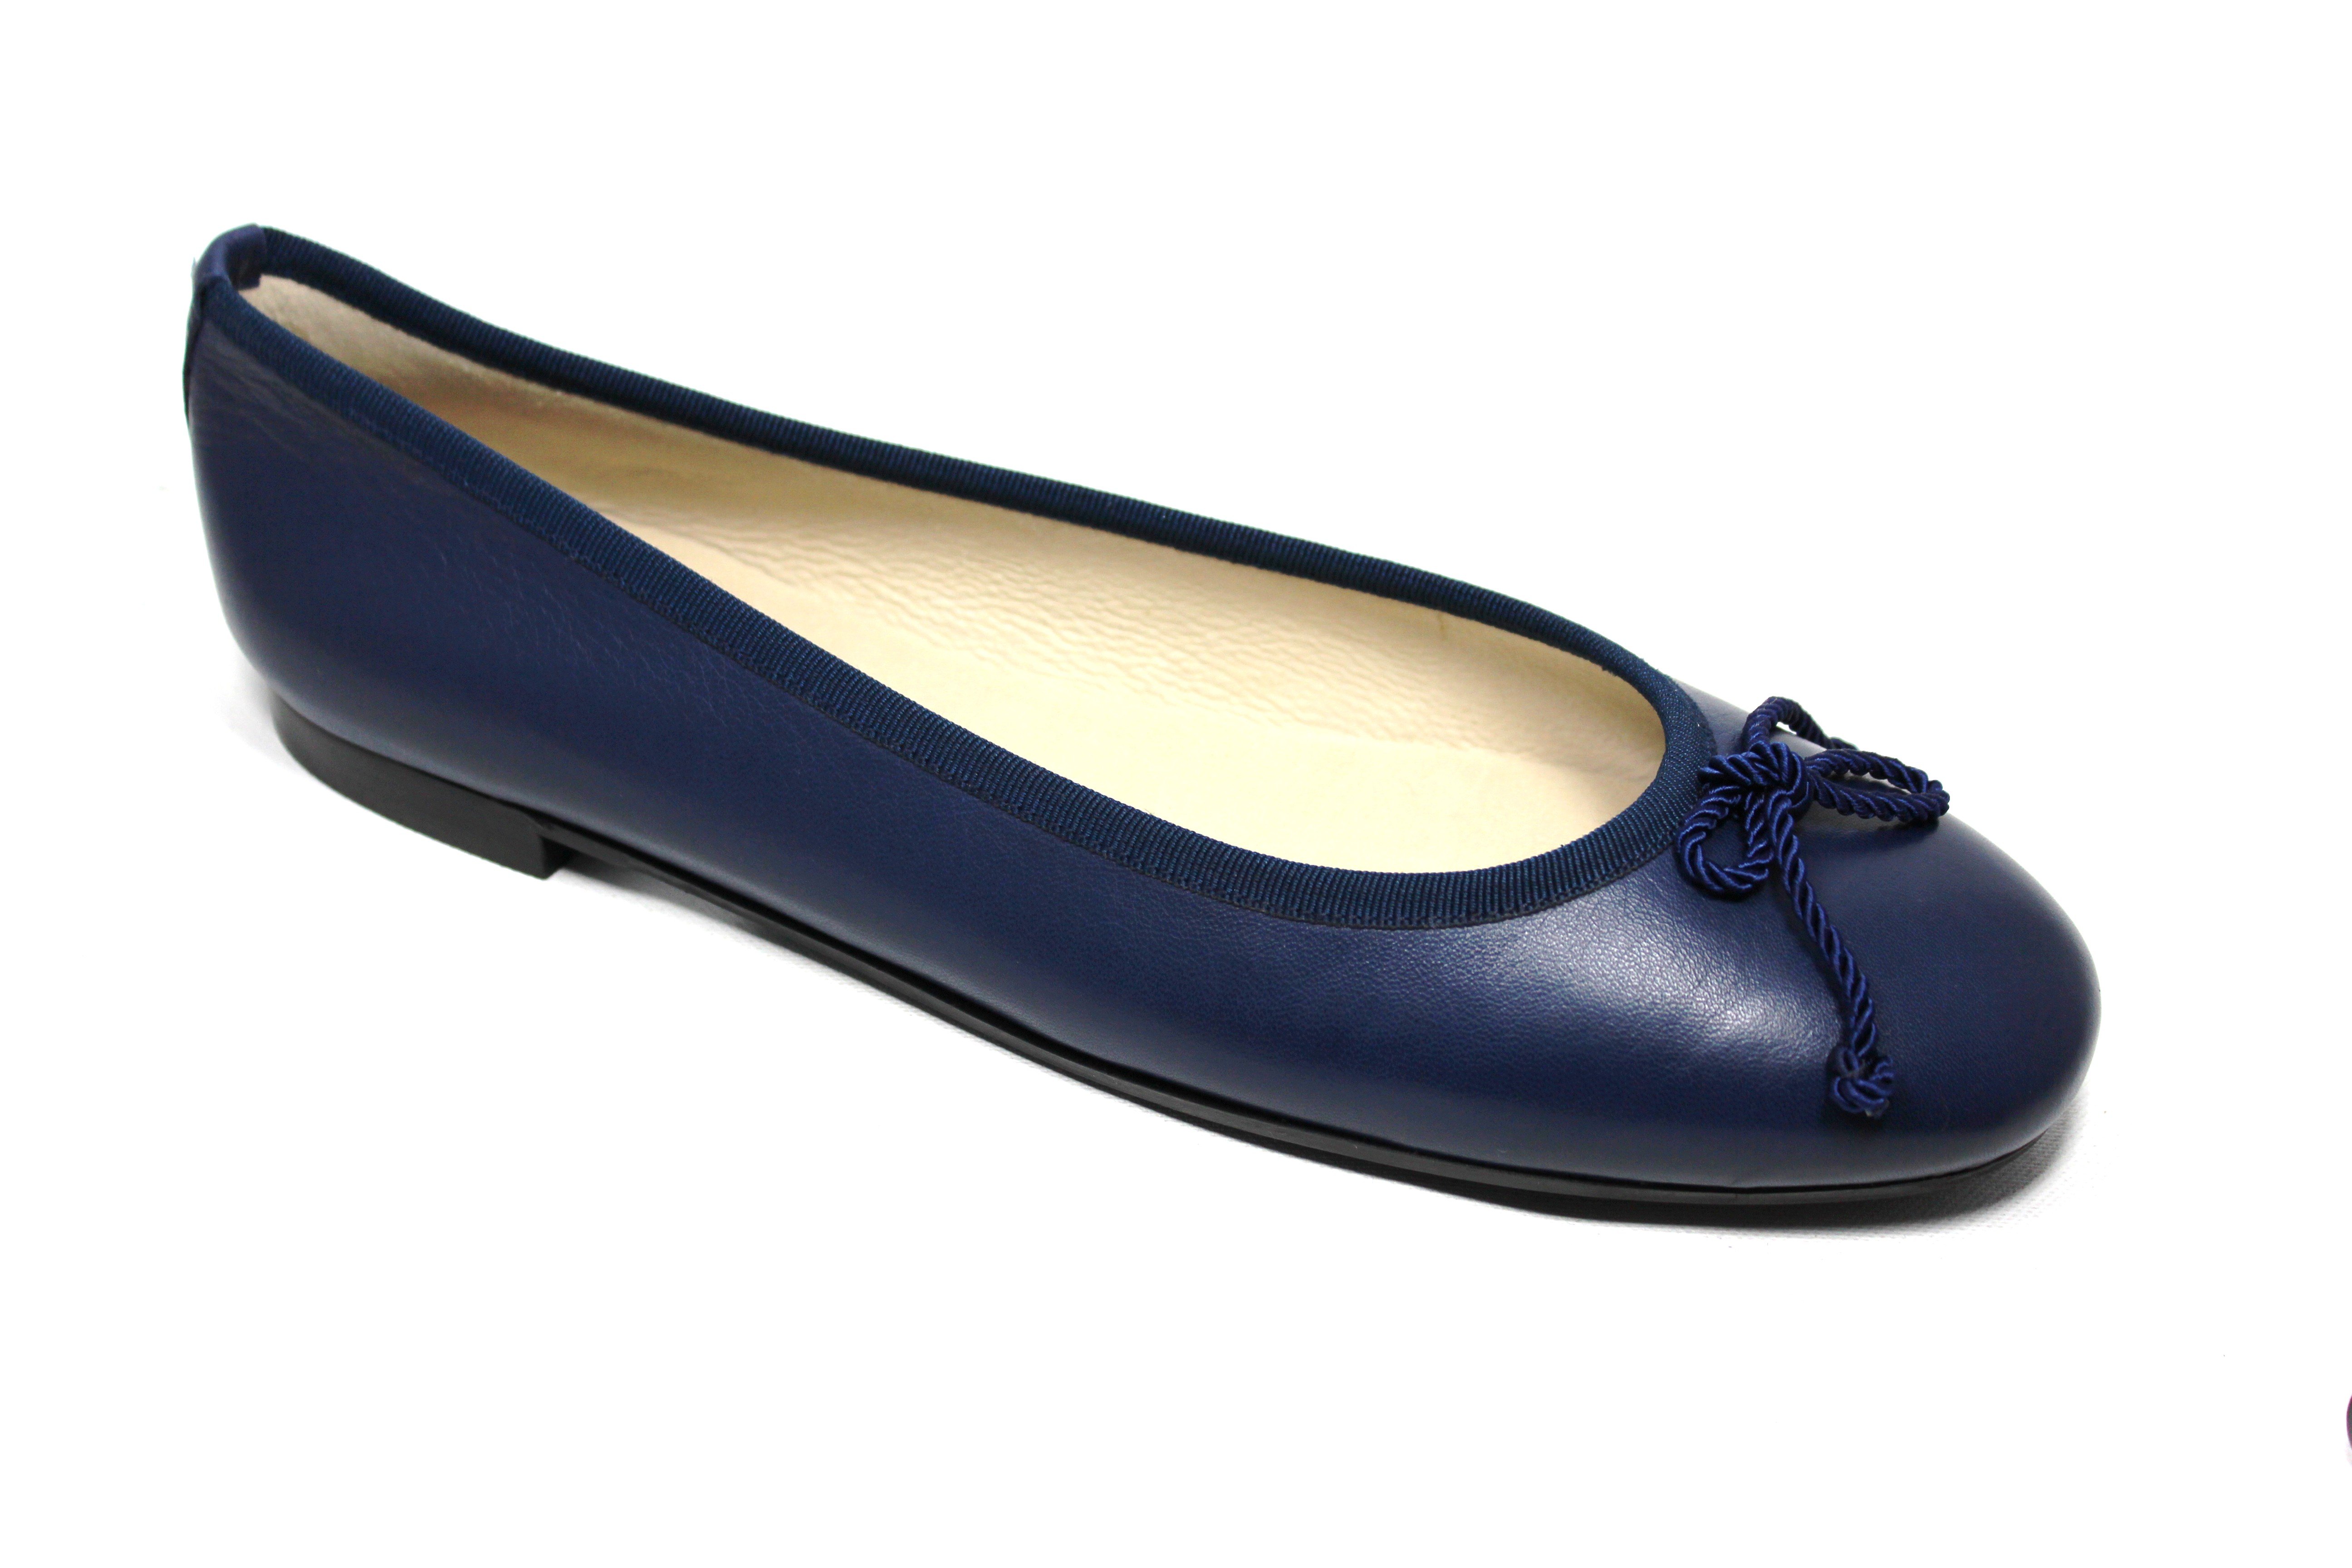 toscanini schuhe in ber und untergr en pretty shoes 22981022 200. Black Bedroom Furniture Sets. Home Design Ideas